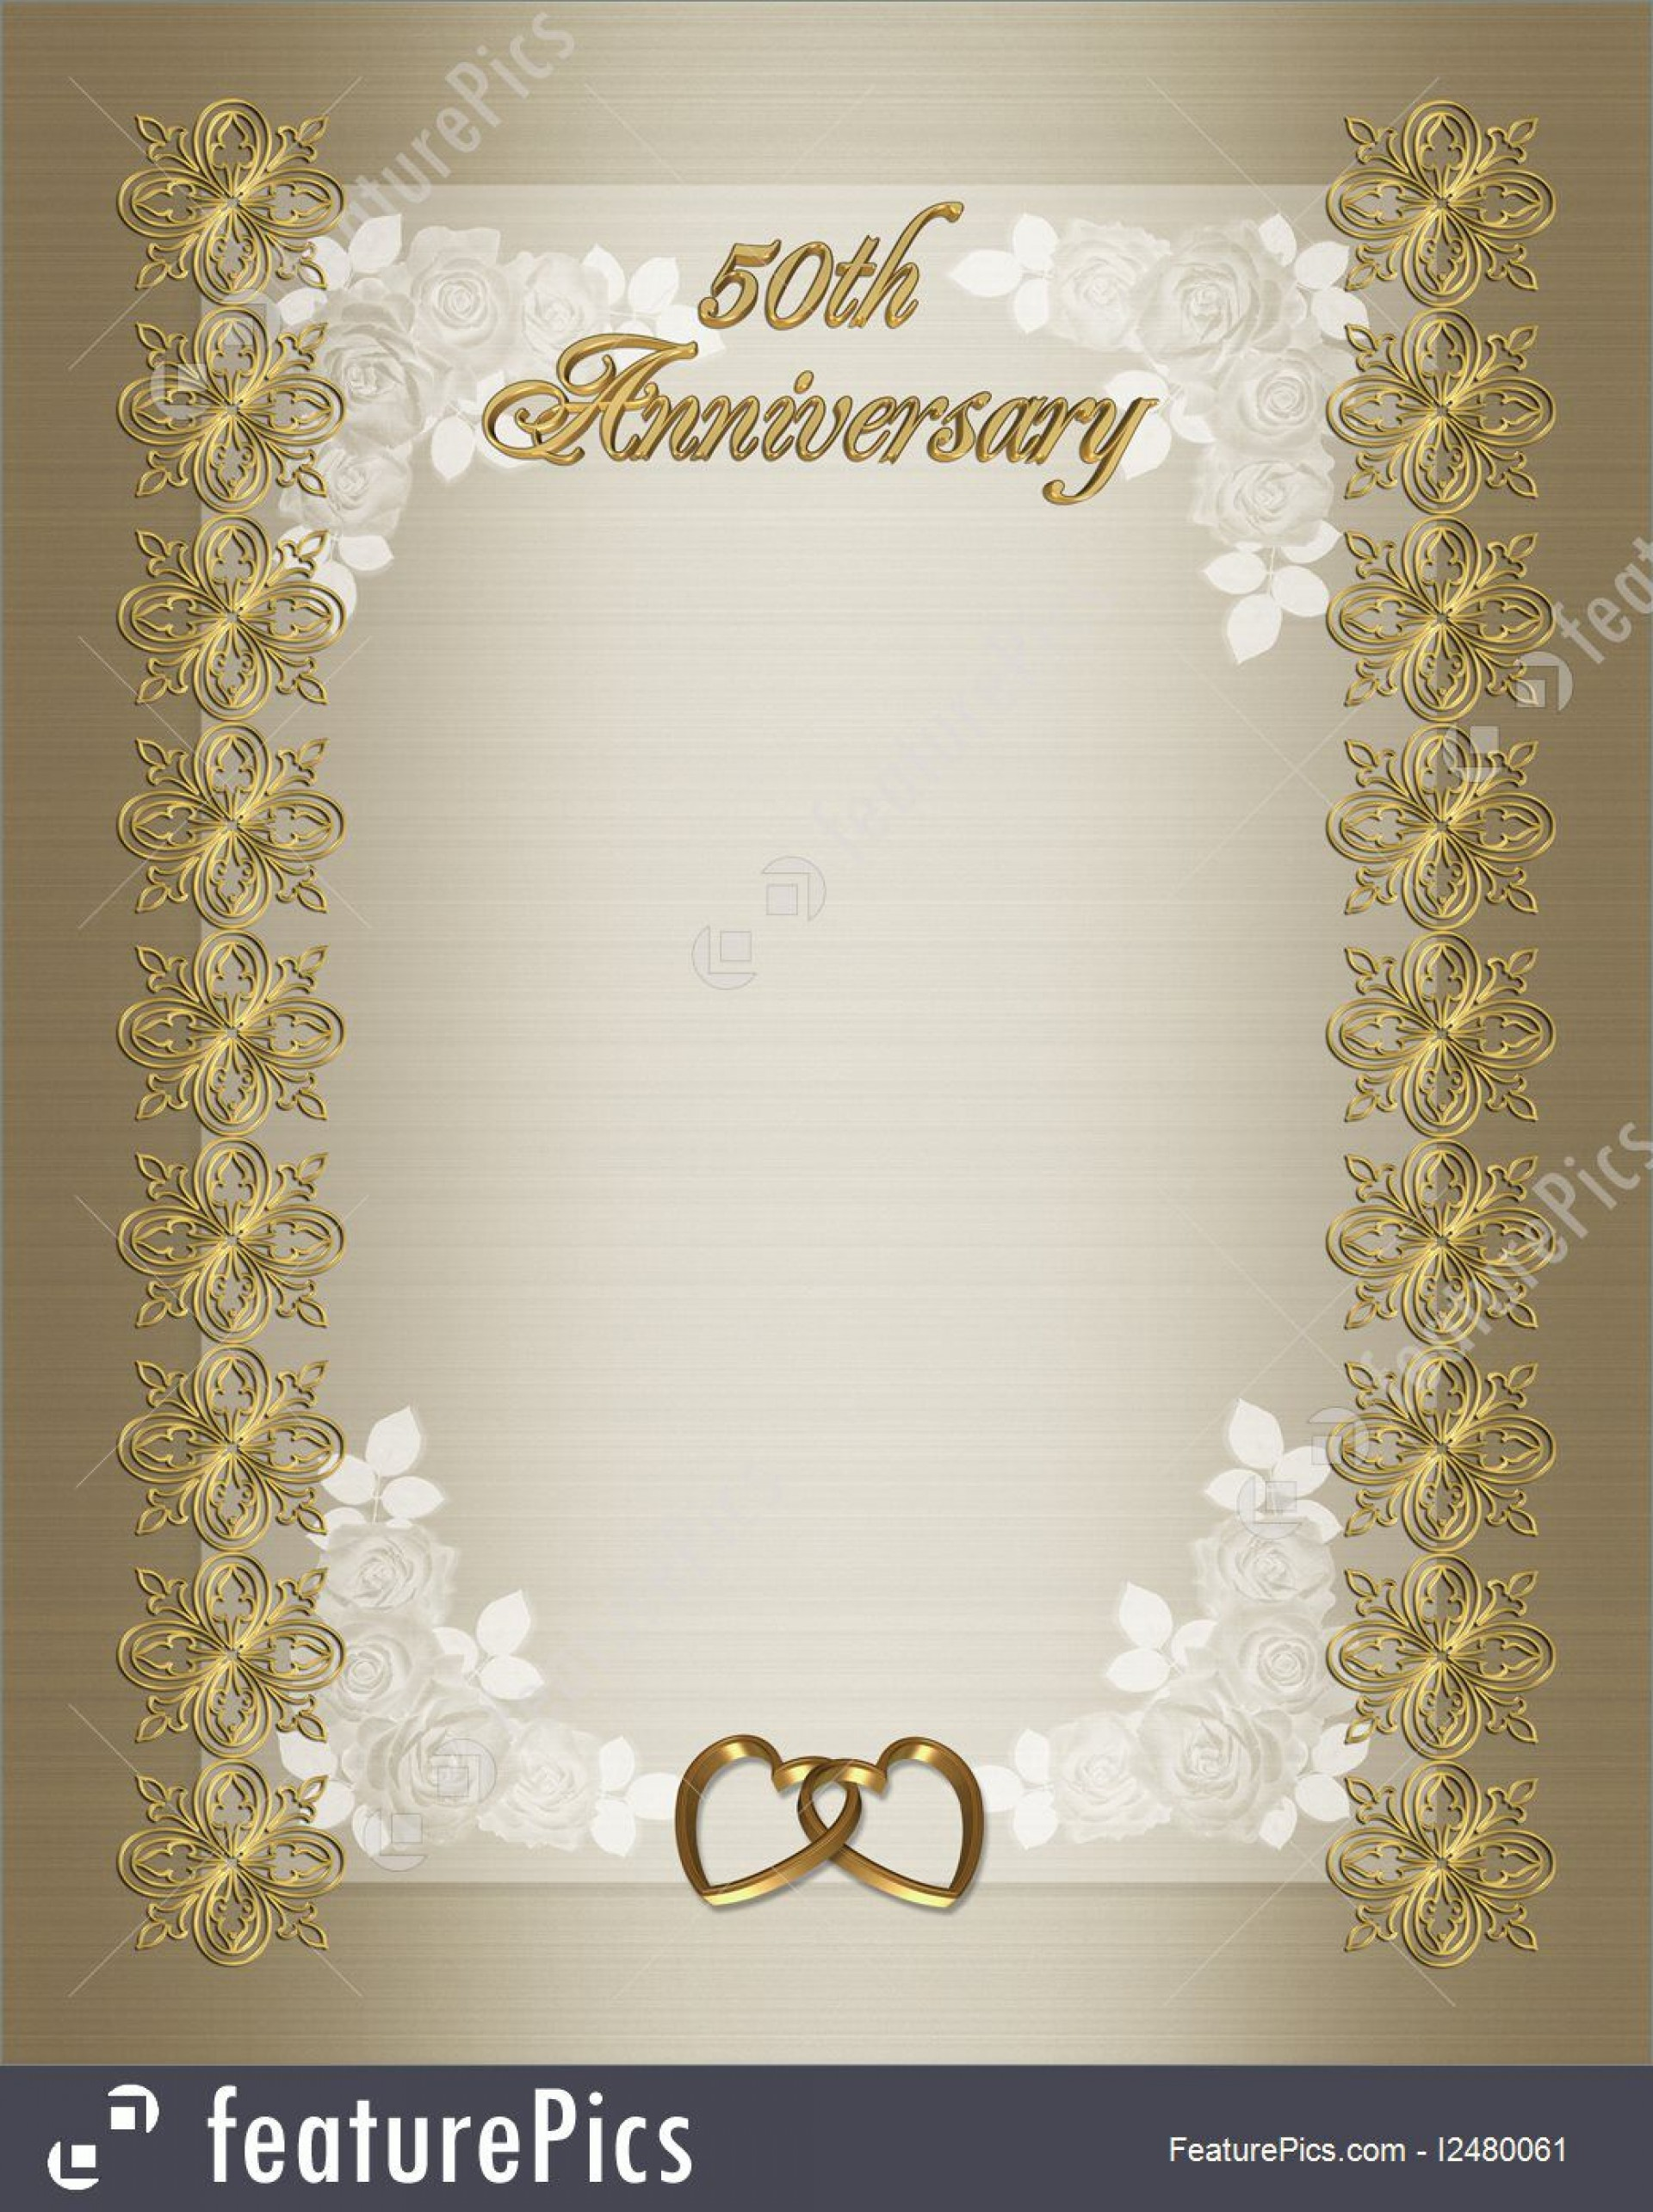 009 Impressive 50th Wedding Anniversary Invitation Sample Inspiration  Samples Free Party Template Card Idea1920